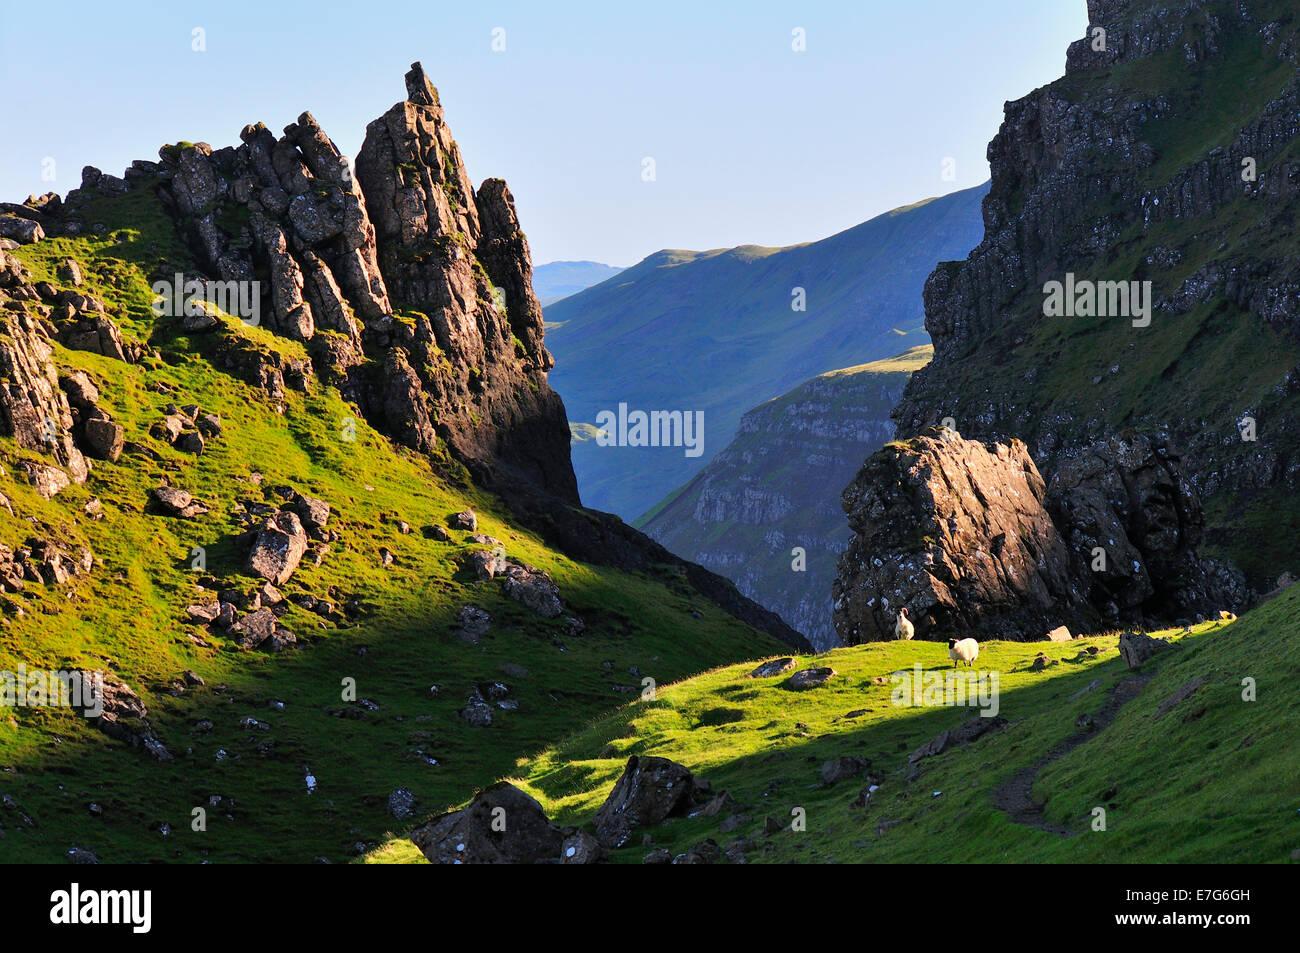 Rock formation on The Storr, Trotternish Peninsula, Ross, Skye and Lochaber, Isle of Skye, Scotland, United Kingdom - Stock Image